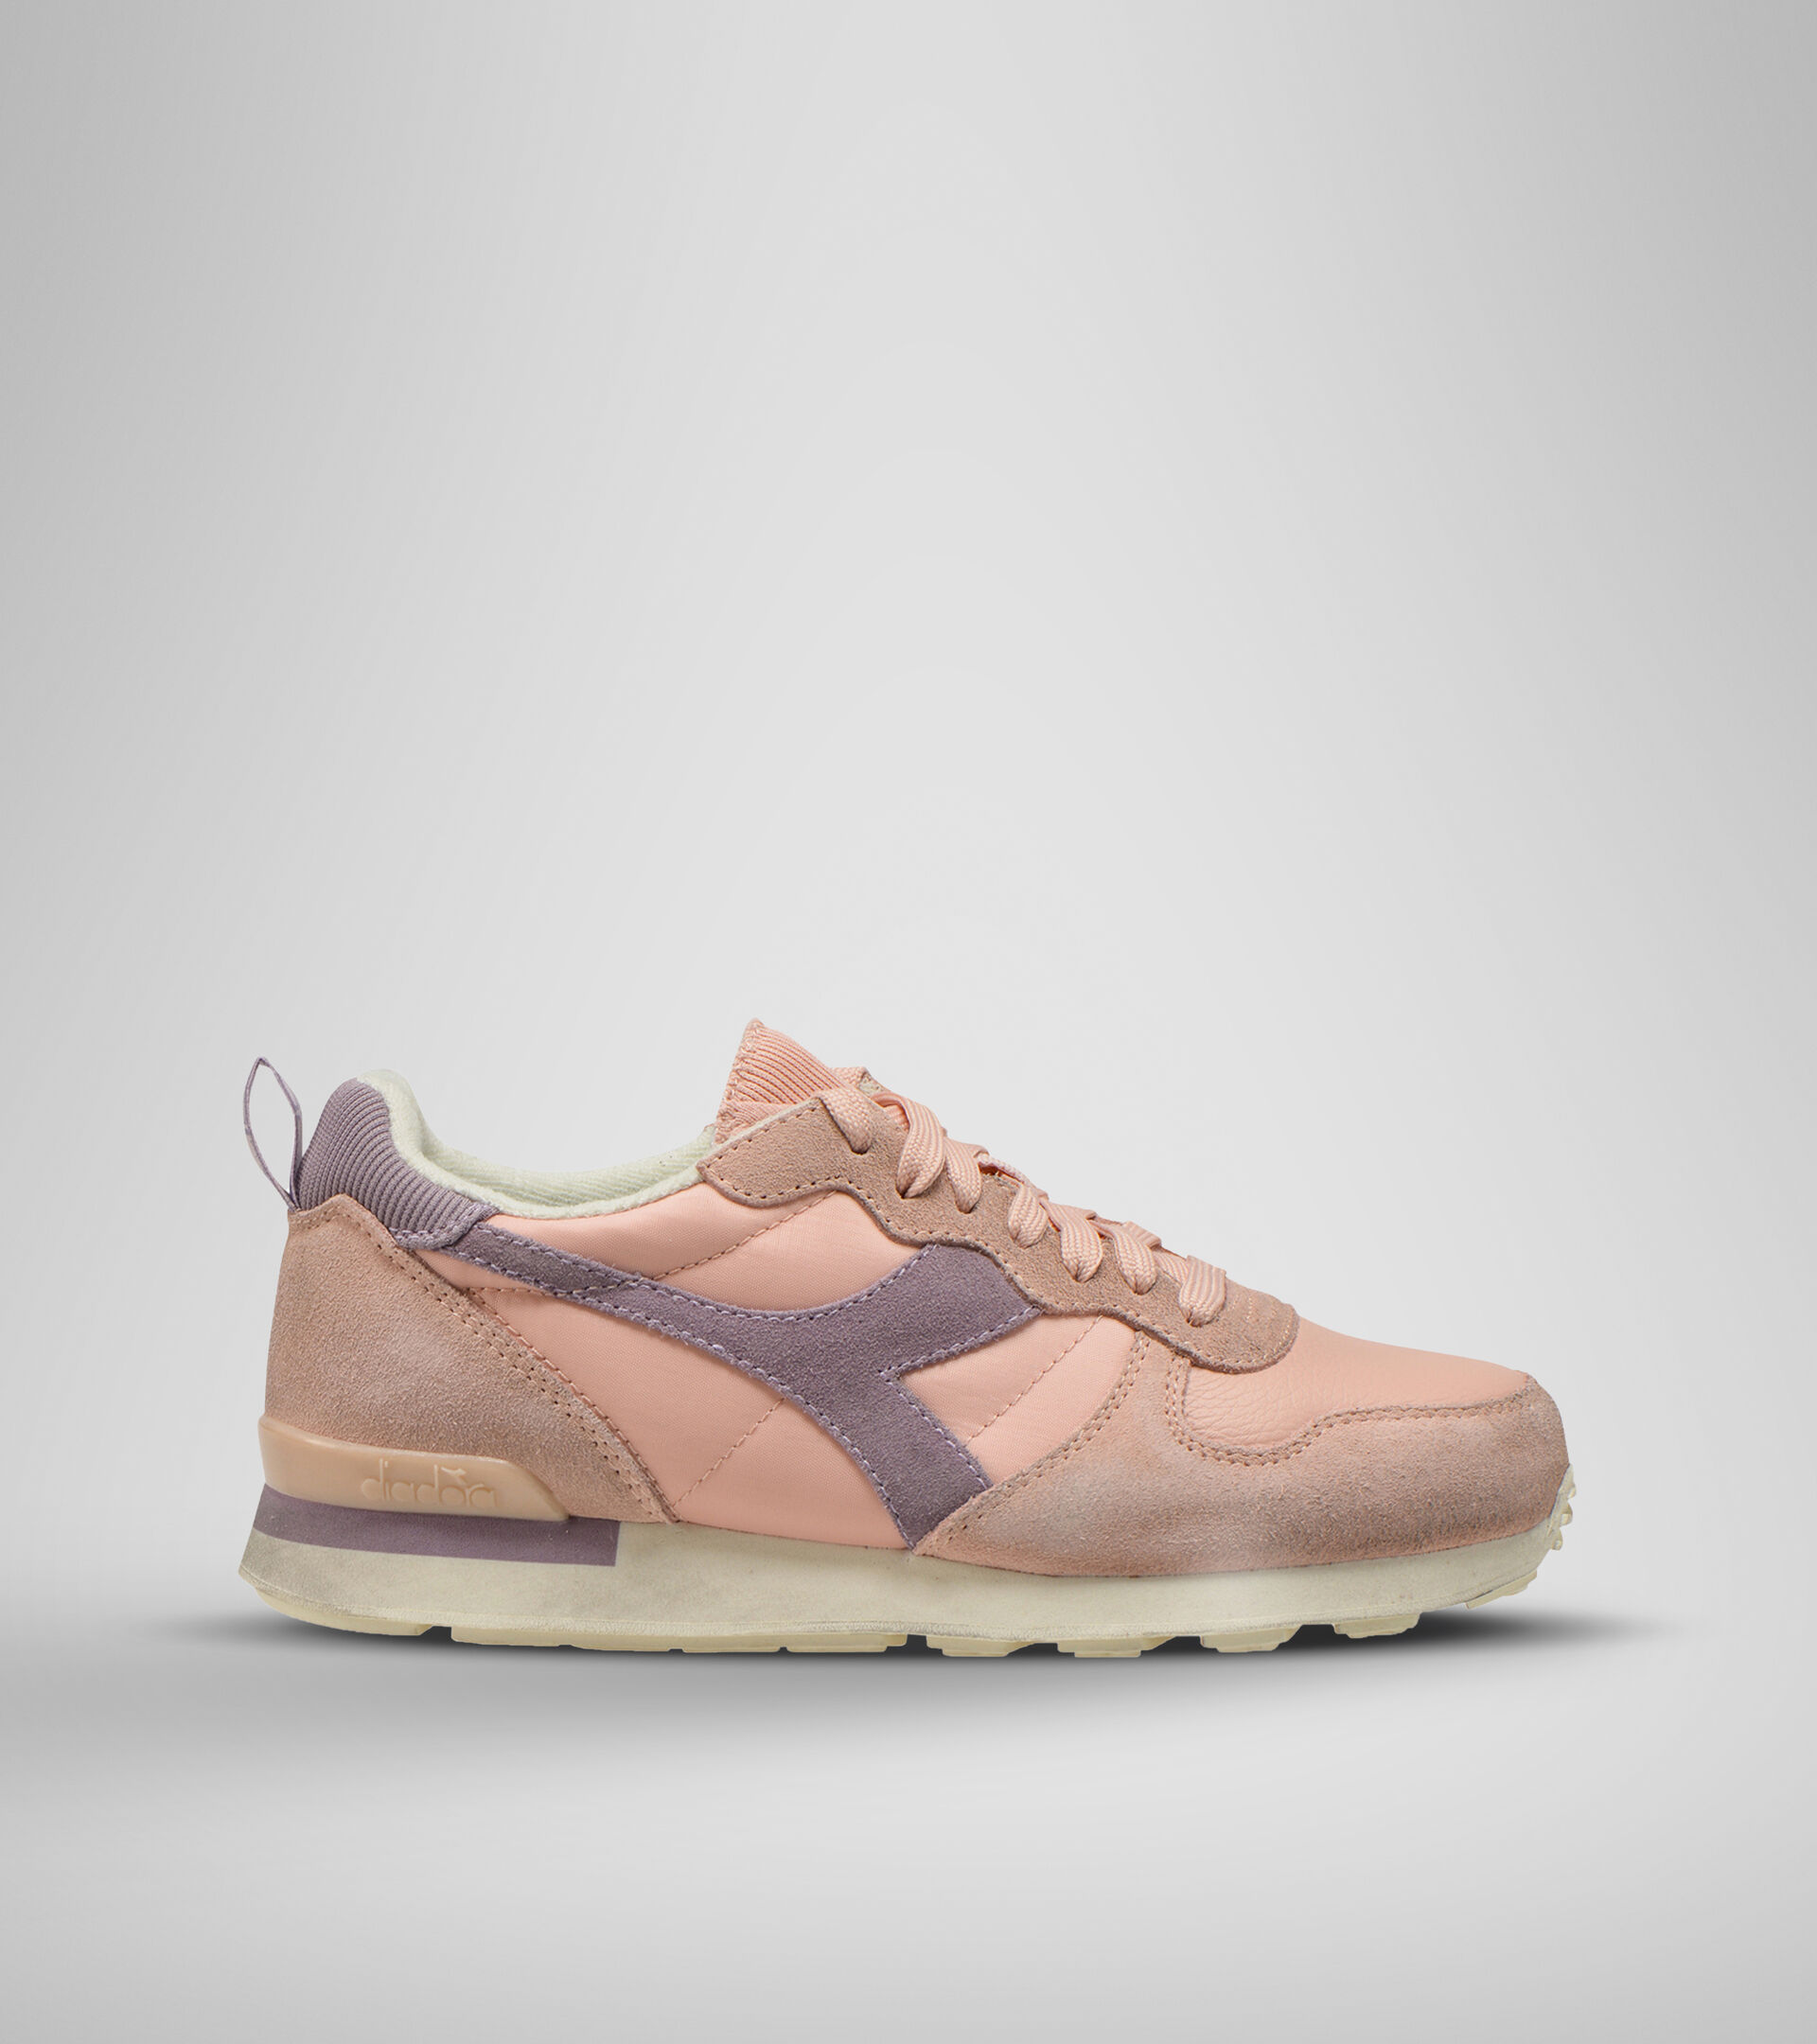 Footwear Sportswear DONNA CAMARO ICONA WN EVENING SAND/NIRVANA Diadora